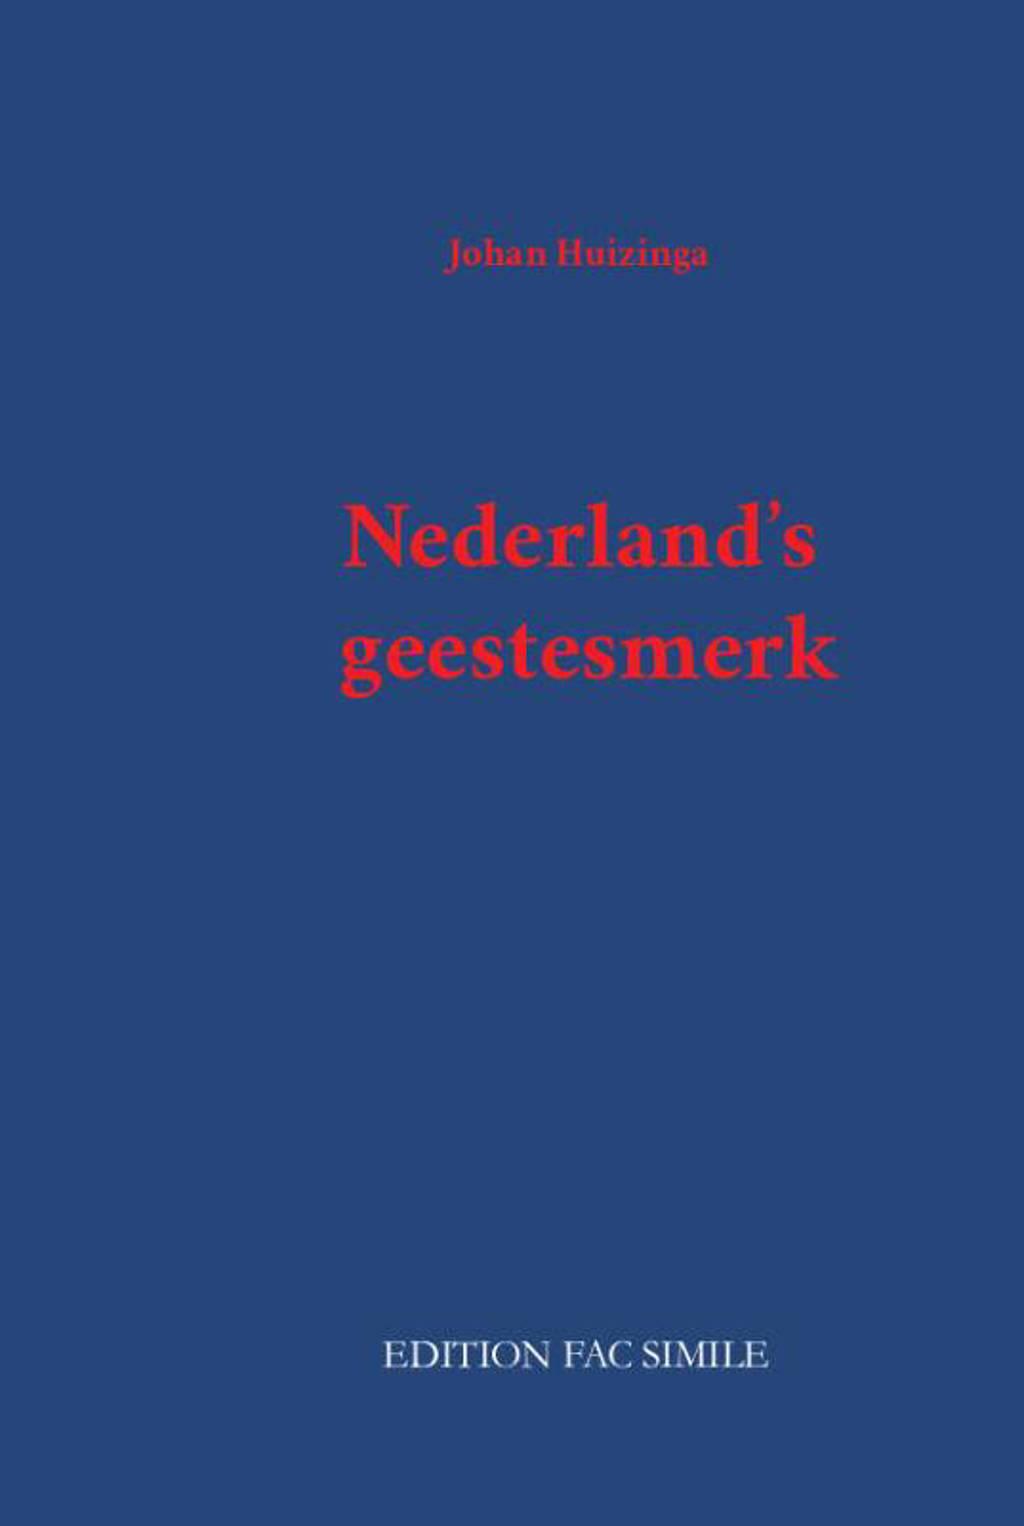 Nederland's geestesmerk - Johan Huizinga